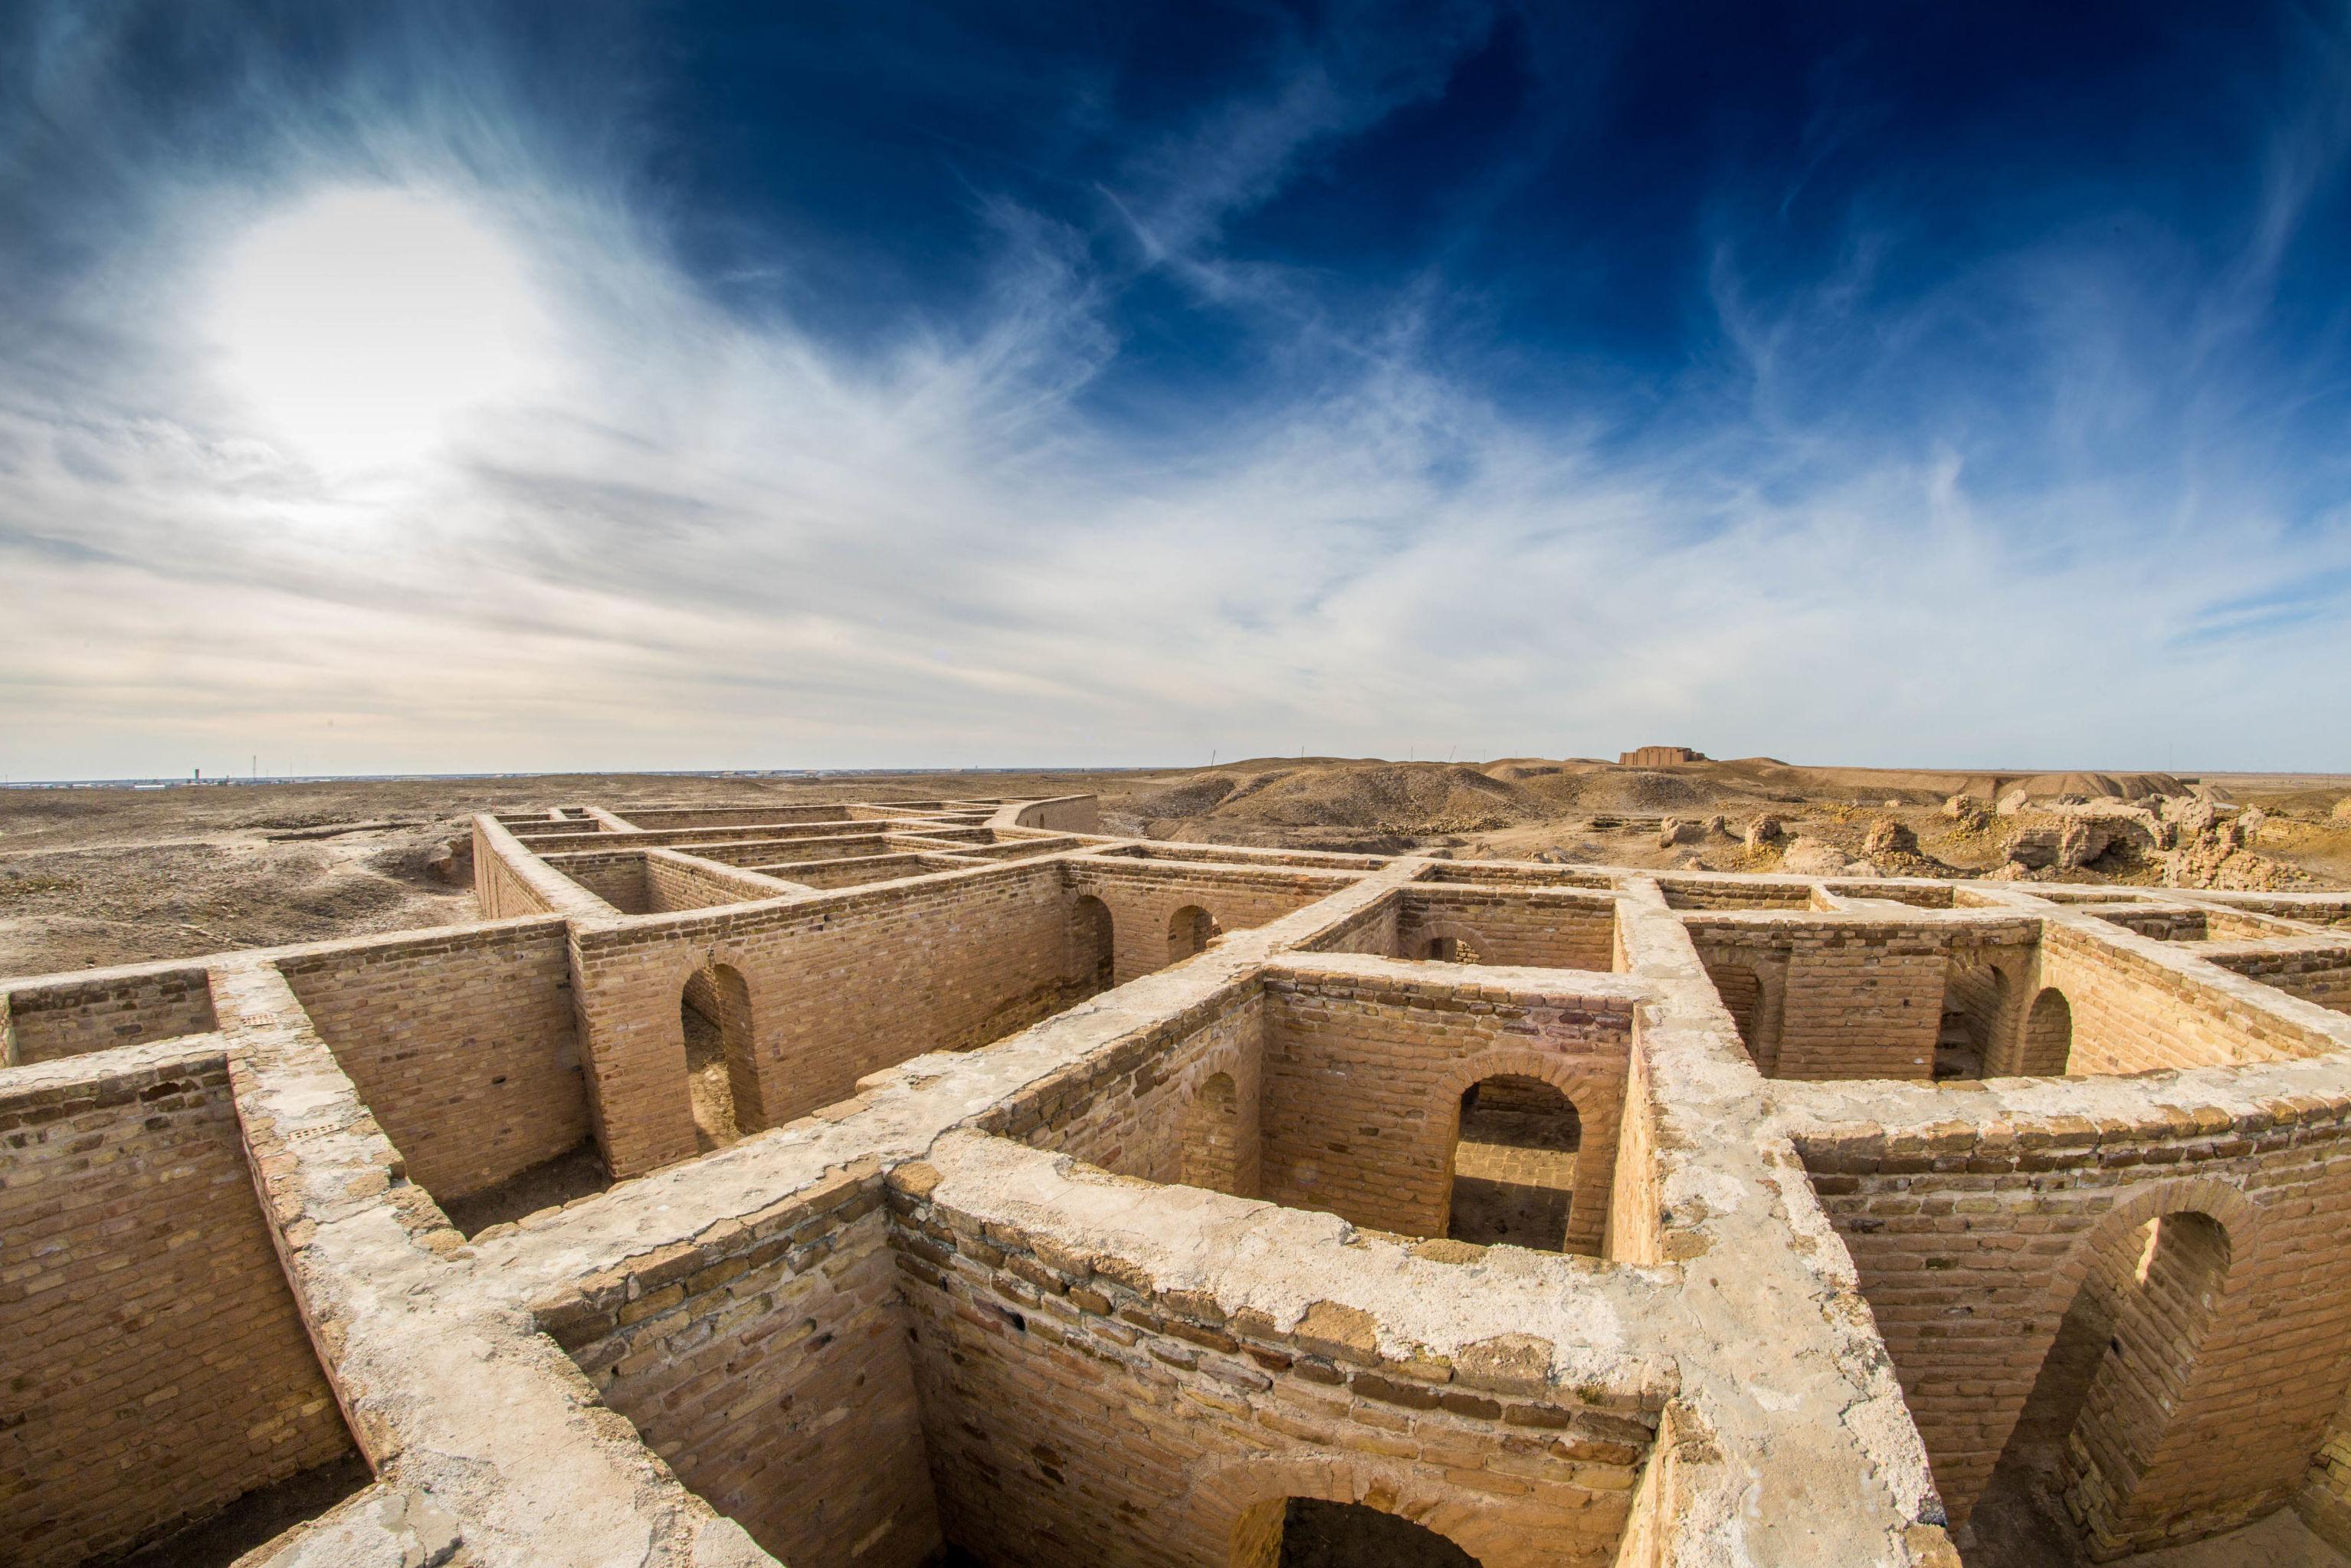 La antigua ciudad mesopotámica de Ur, en la actual Irak